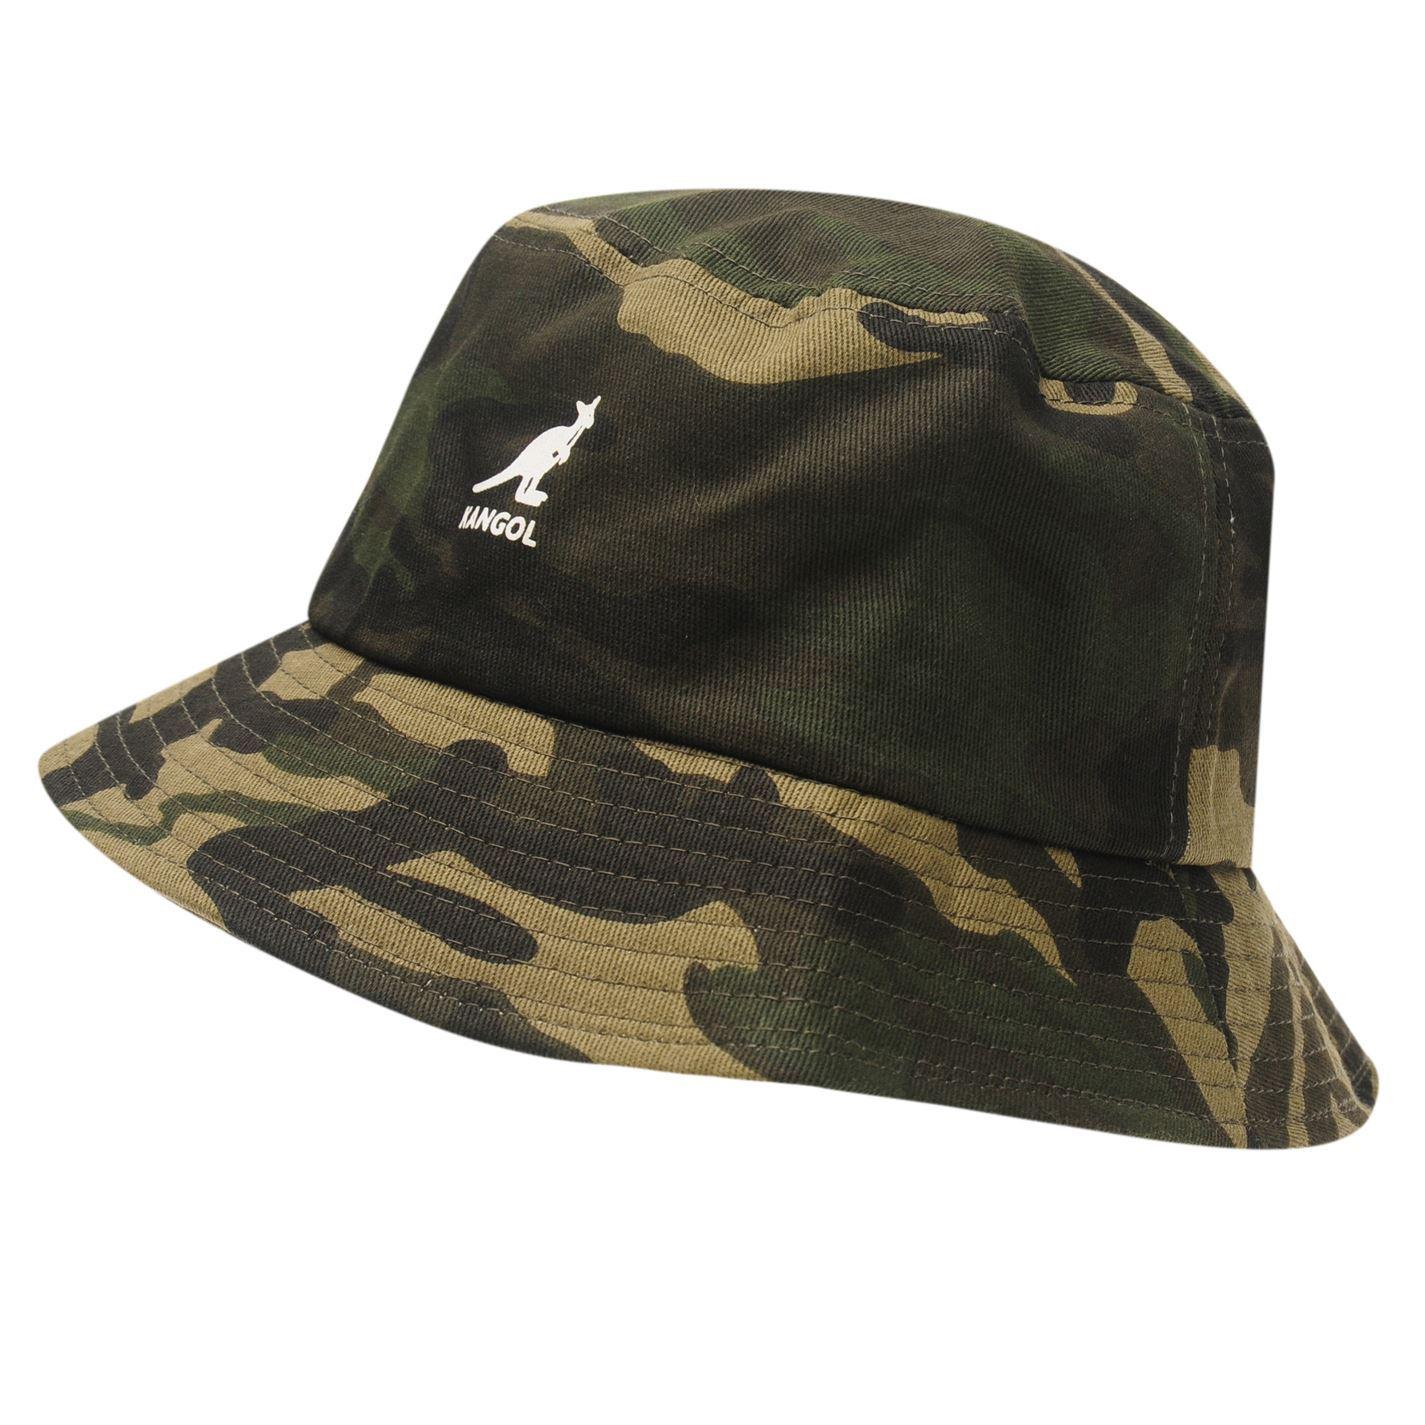 Kangol Mens Camouflage Bucket Hat Cotton Pattern | eBay